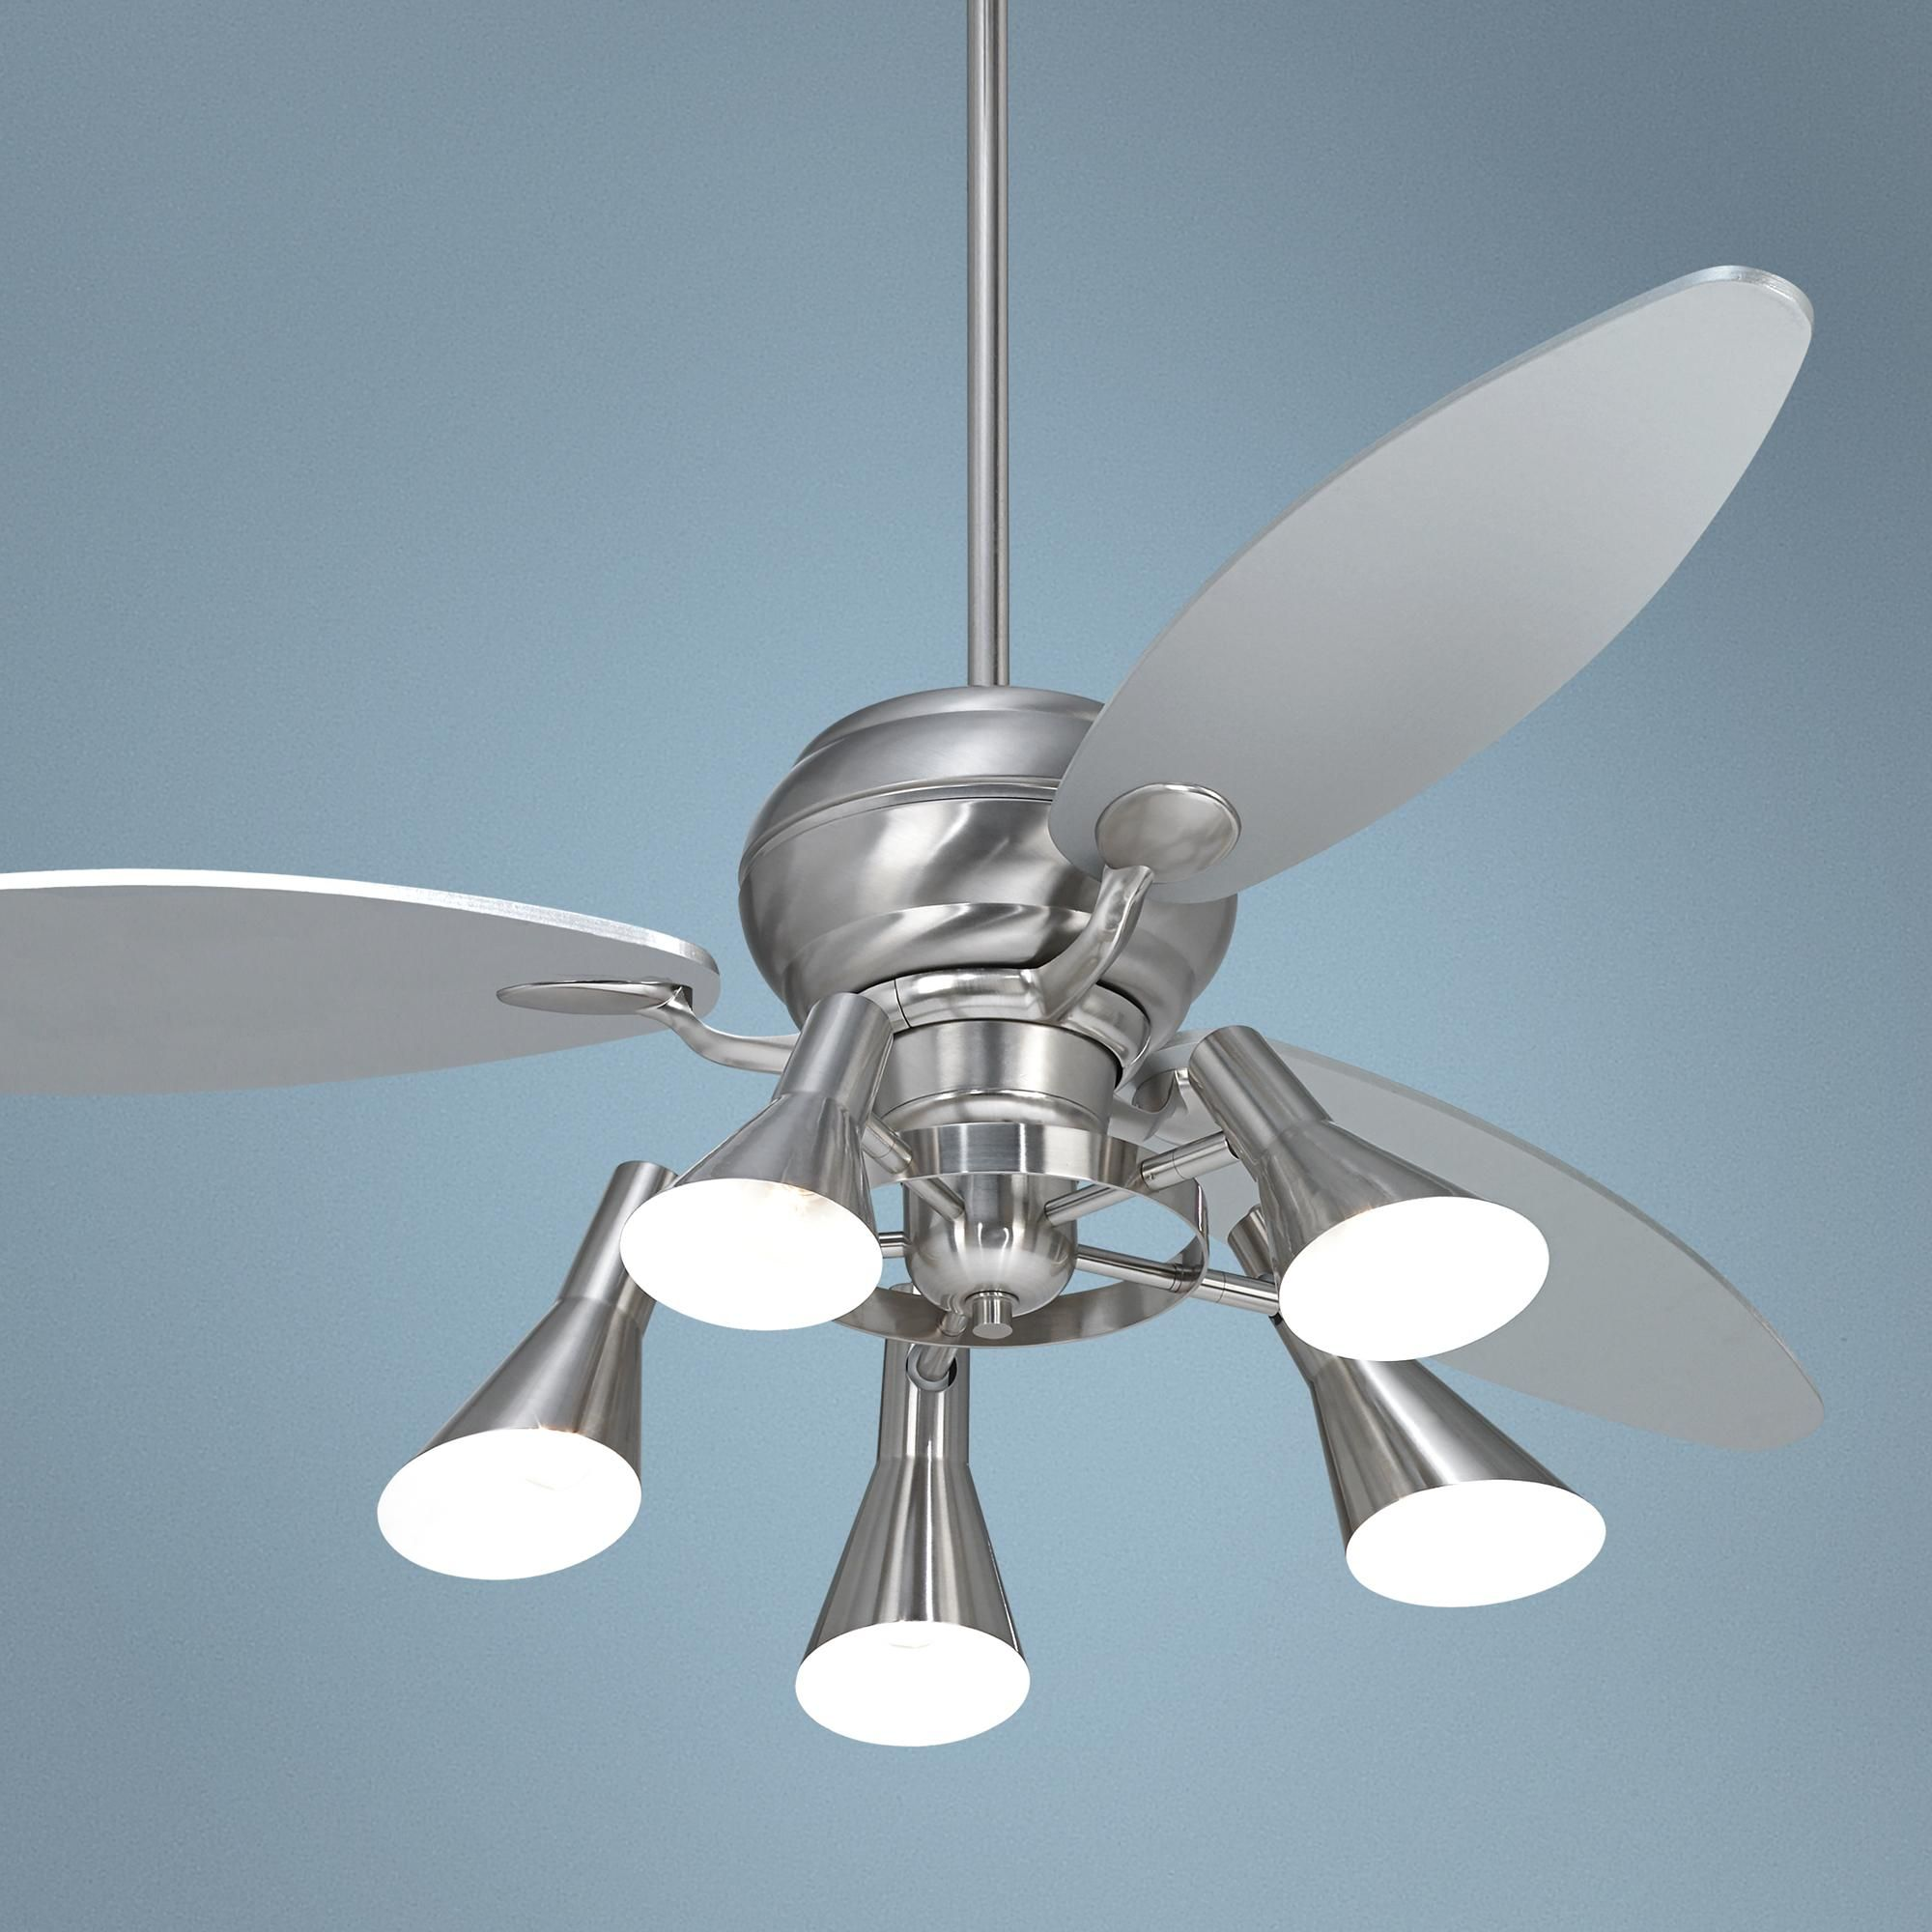 "60"" Spyder™ Brushed Steel Ceiling Fan with 5 Light Kit"